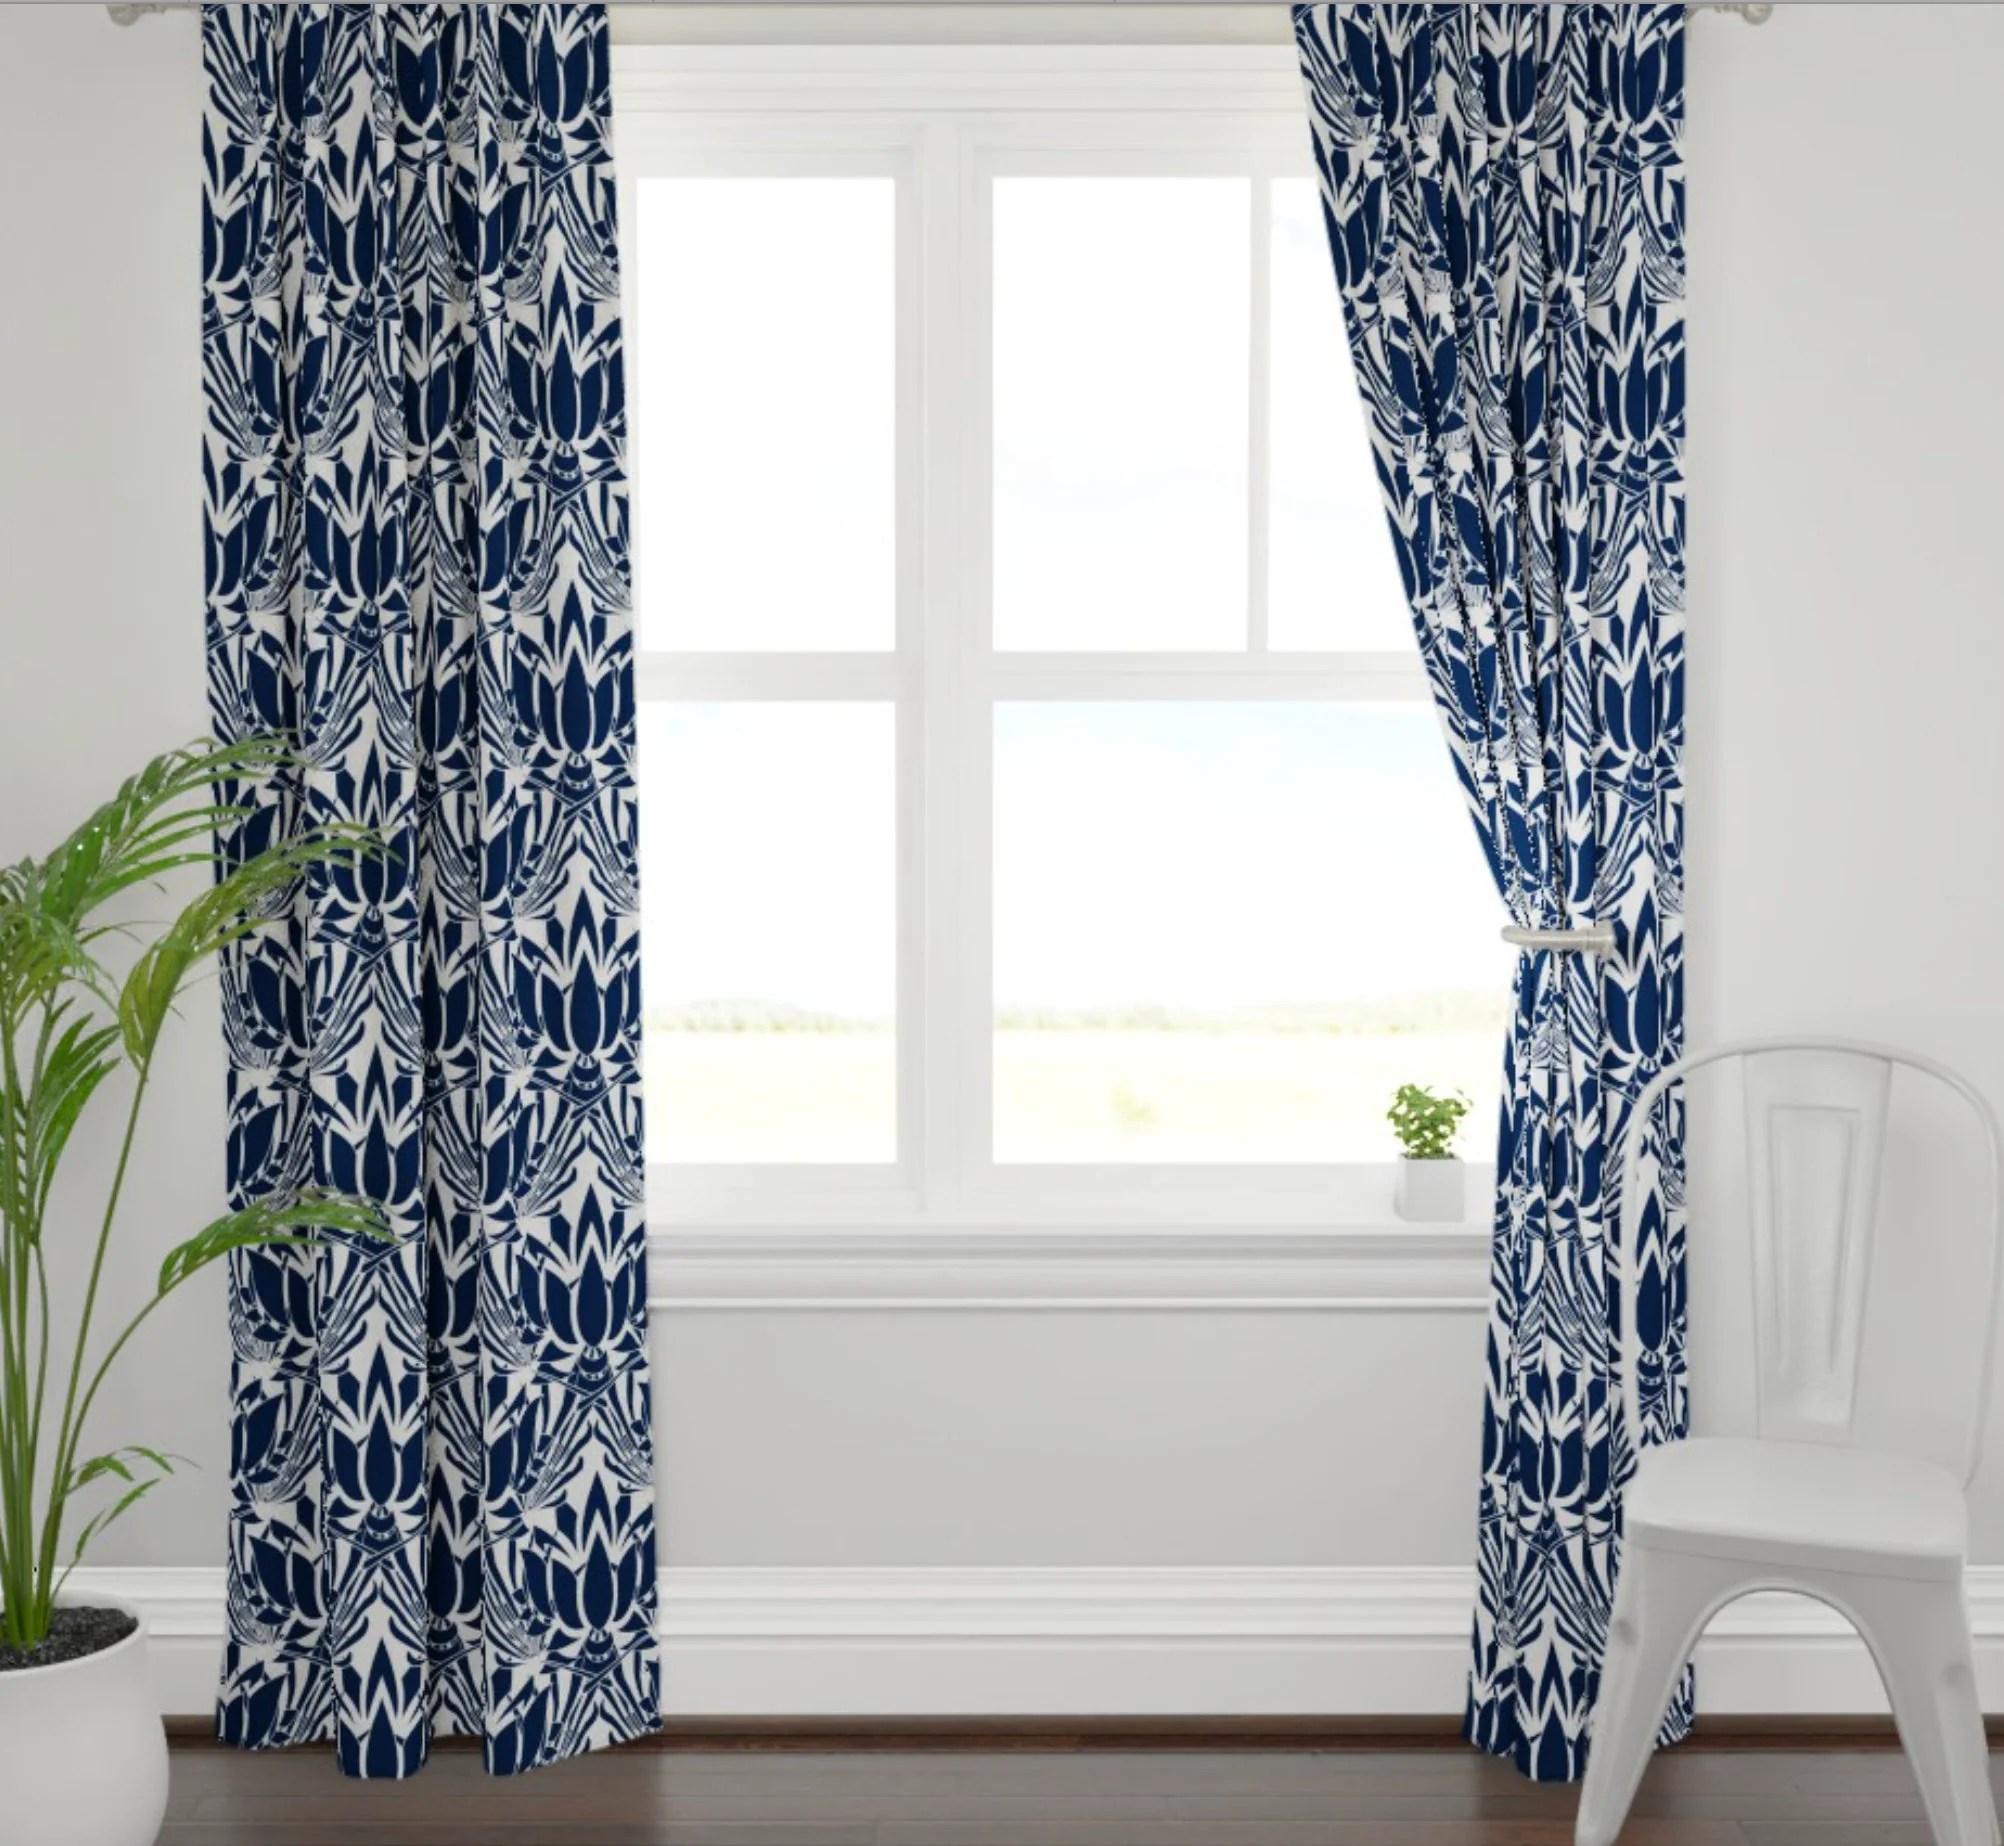 Lotus Print Curtains Navy Curtains Dining Room Curtains Navy Living Room Curtains Navy Lotus Fabric Blue Lotus Fabric Dining Room Drapes